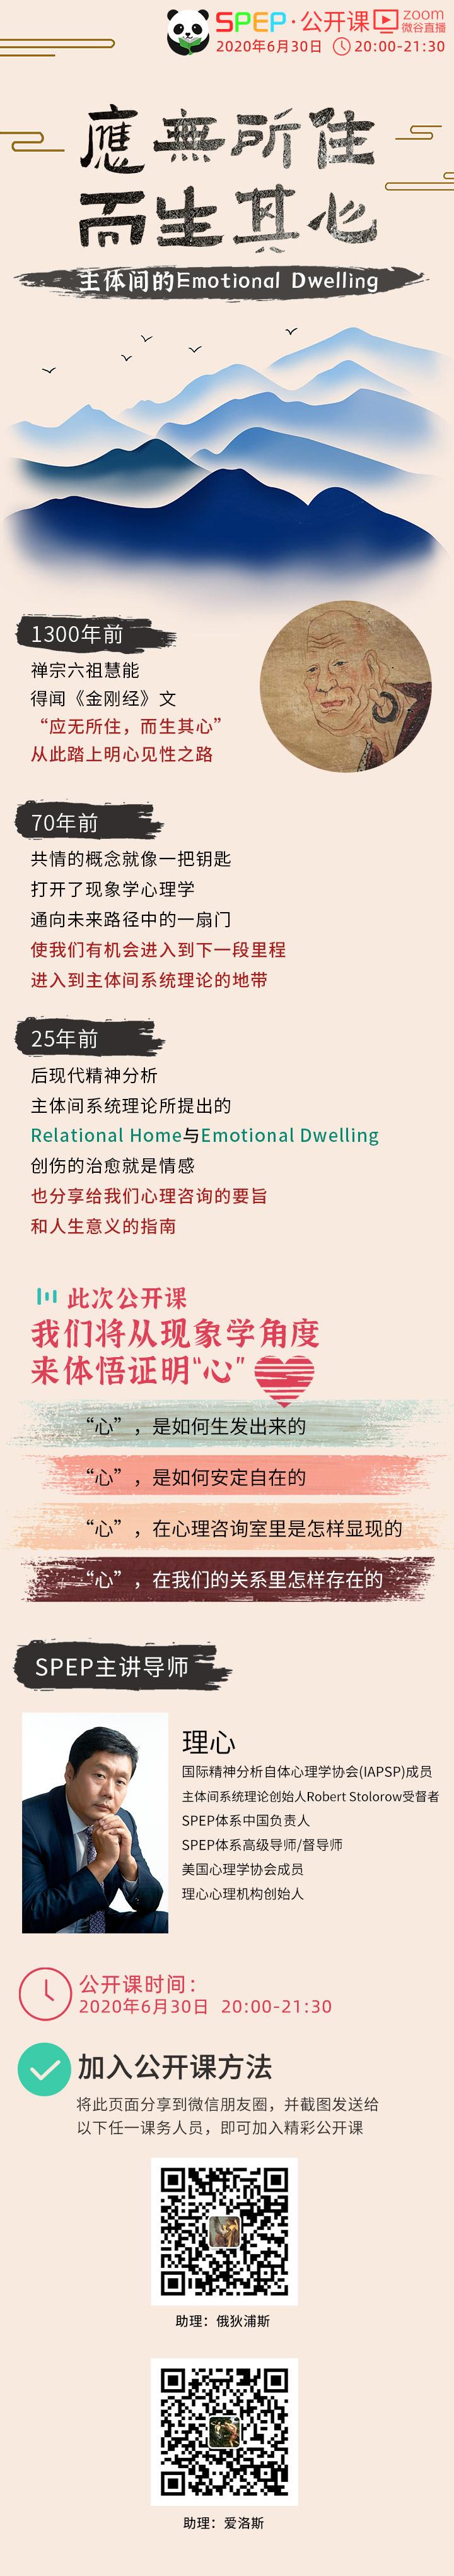 SPEP公开课| 应无所住,而生其心——主体间的Emotional Dwelling